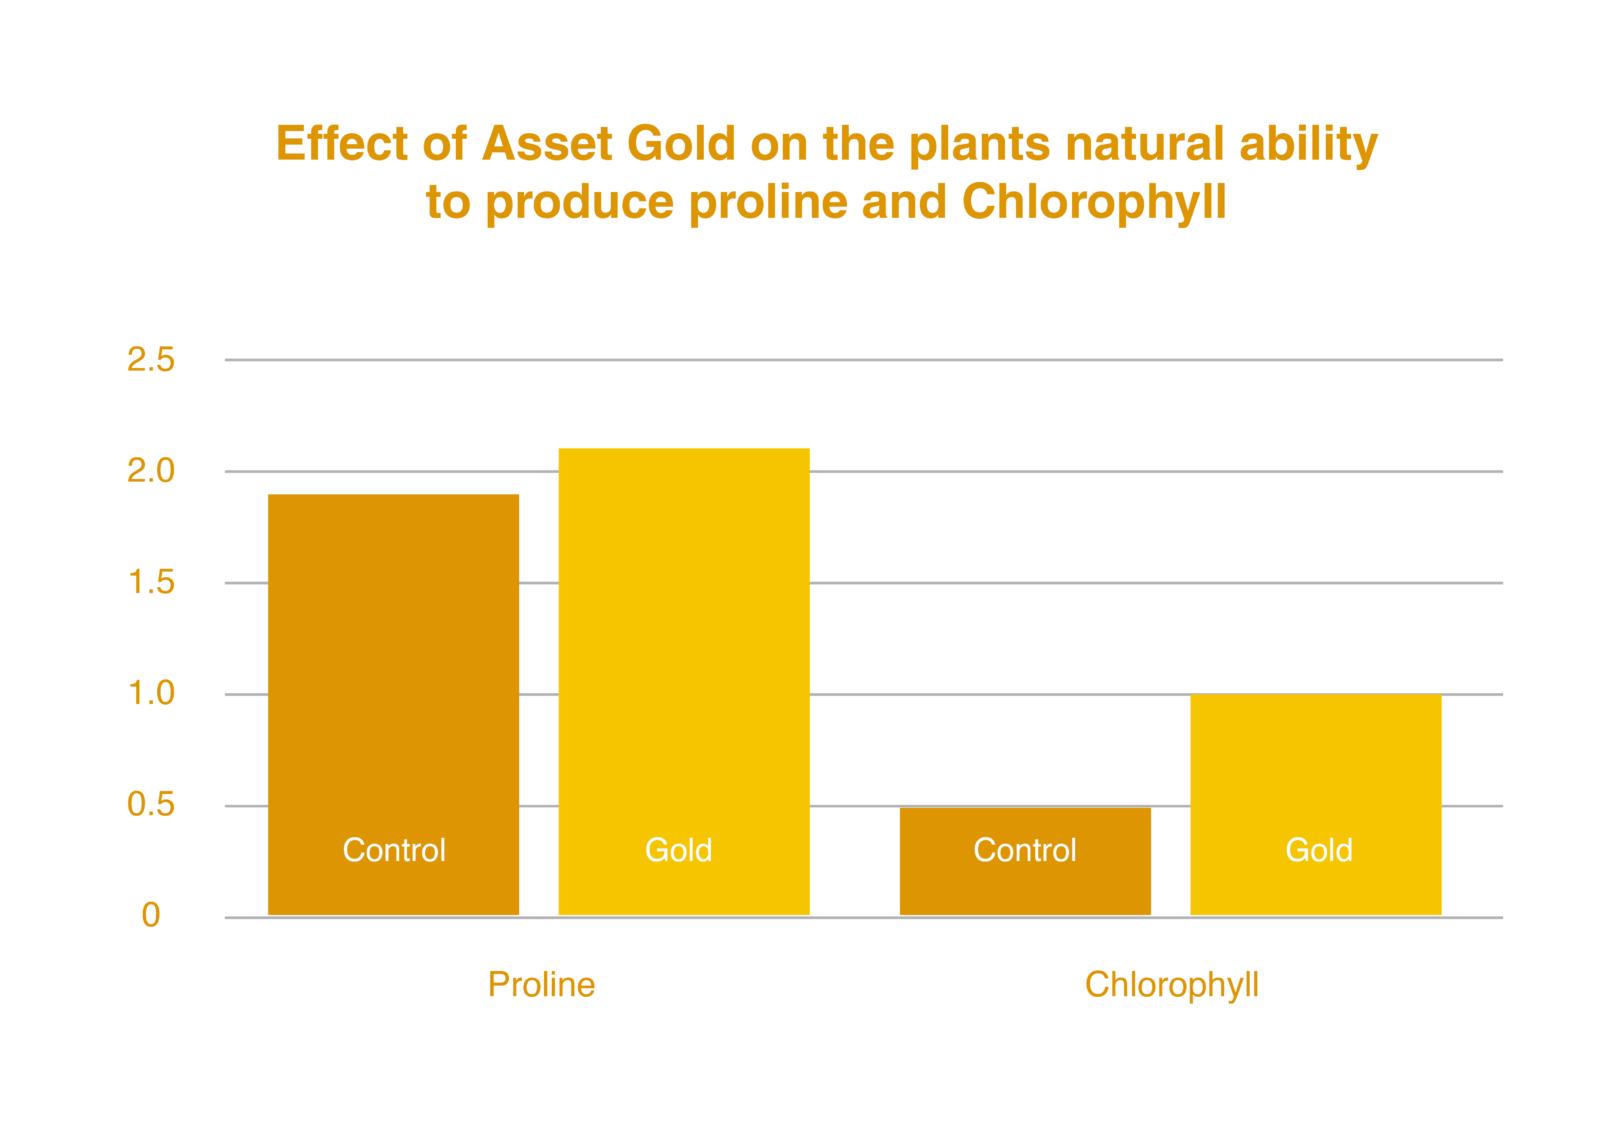 Asset-Gold-increase-proline-and-chlorophyll